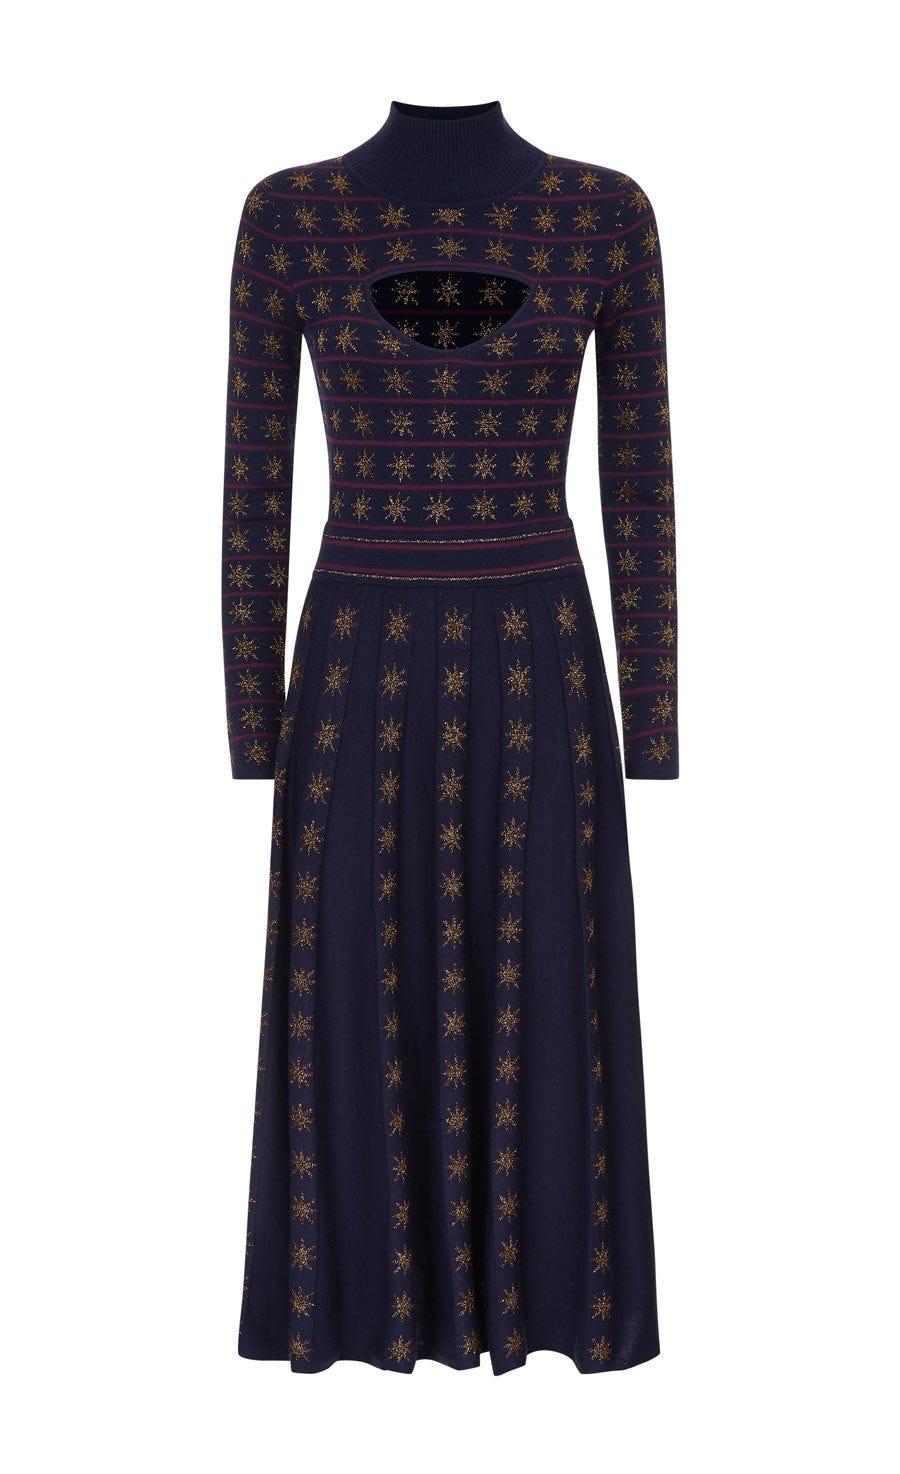 Night Knit Dress